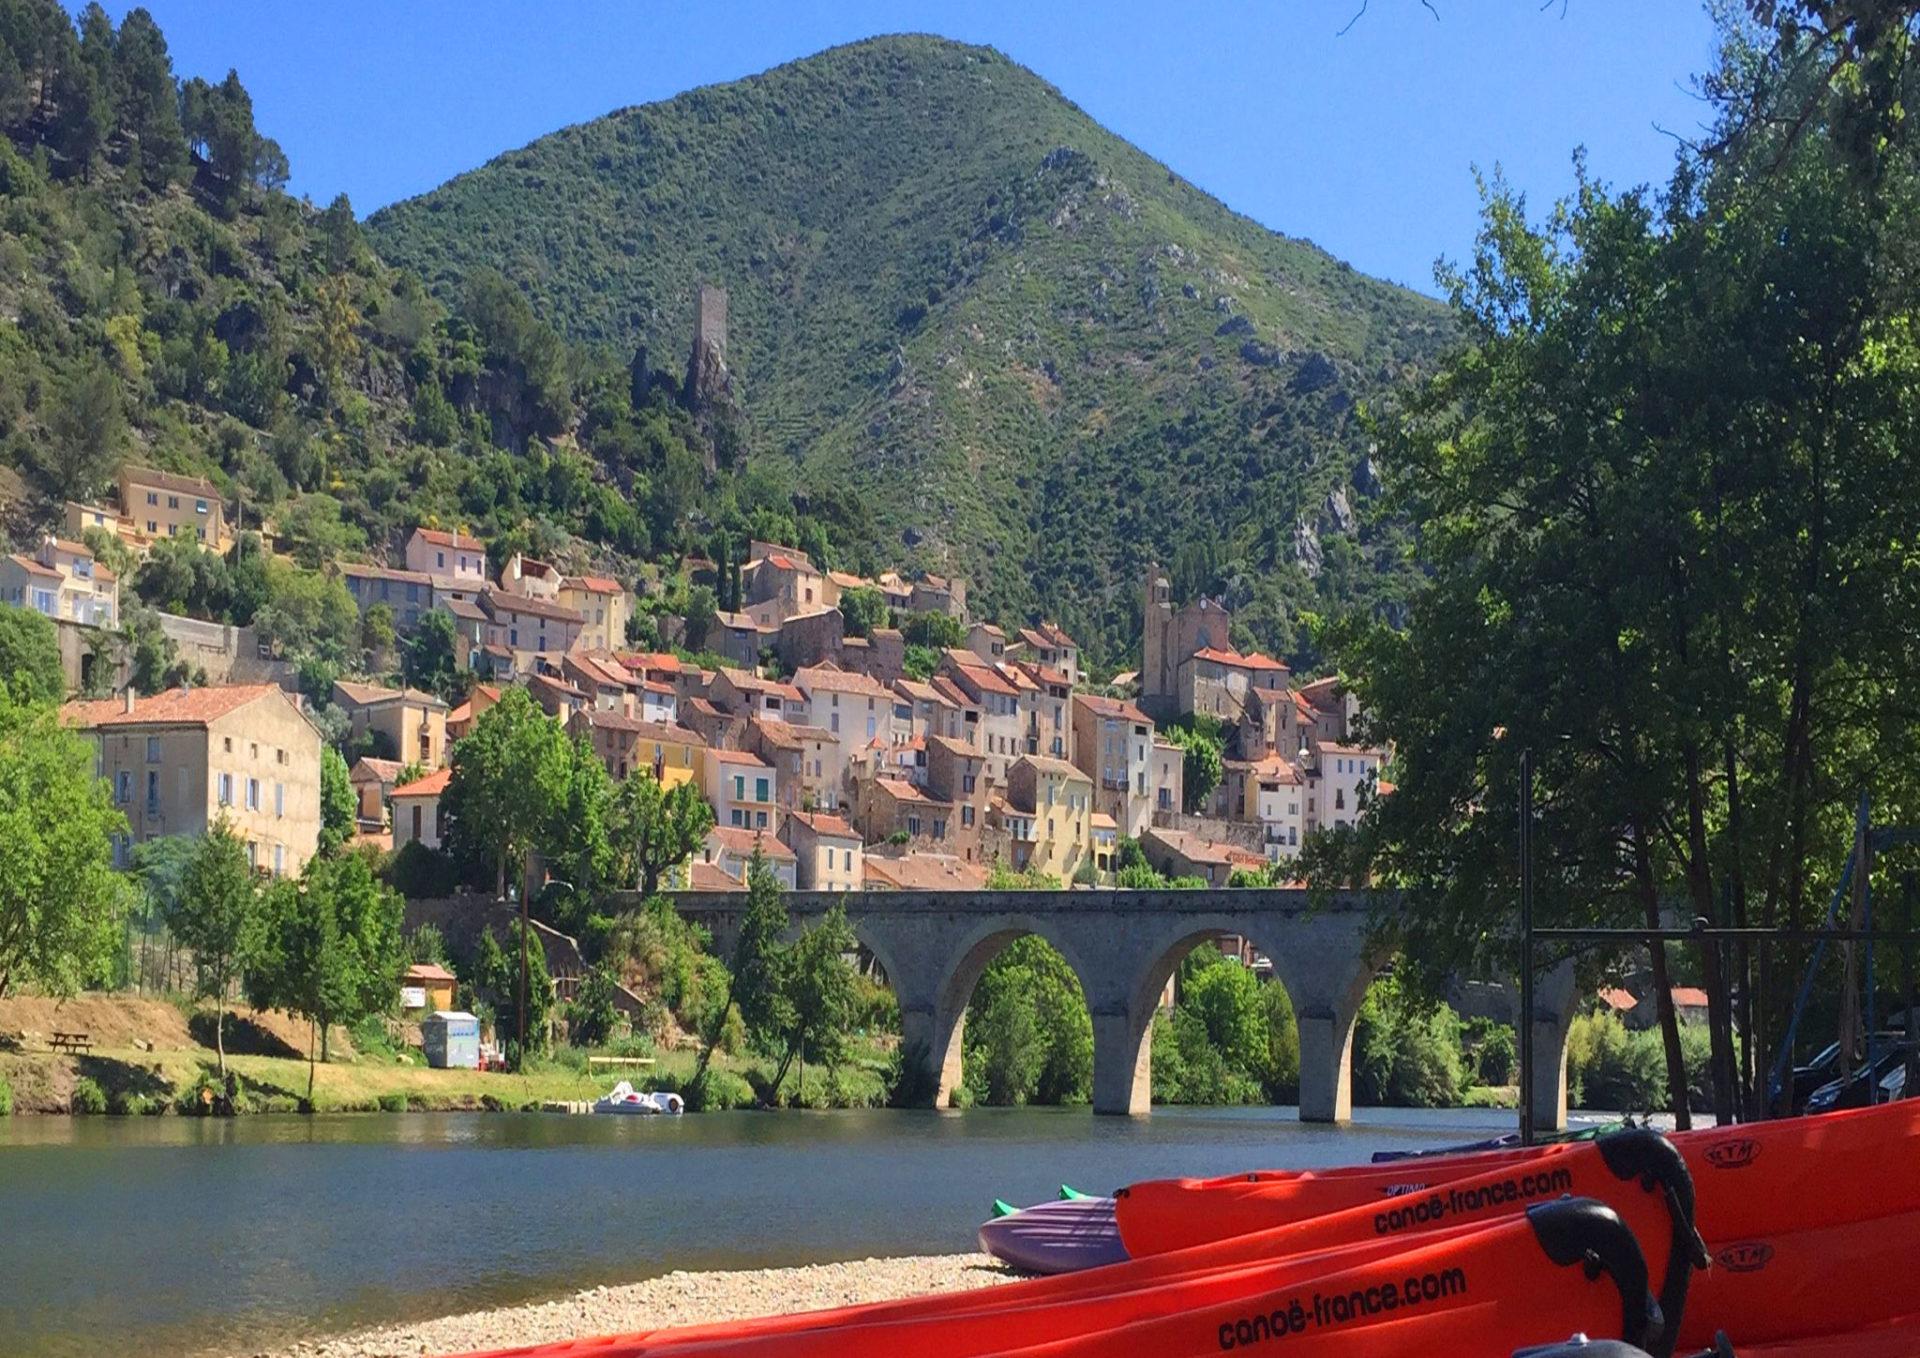 Base de location canoe kayak sup stand up paddle à Roquebrun